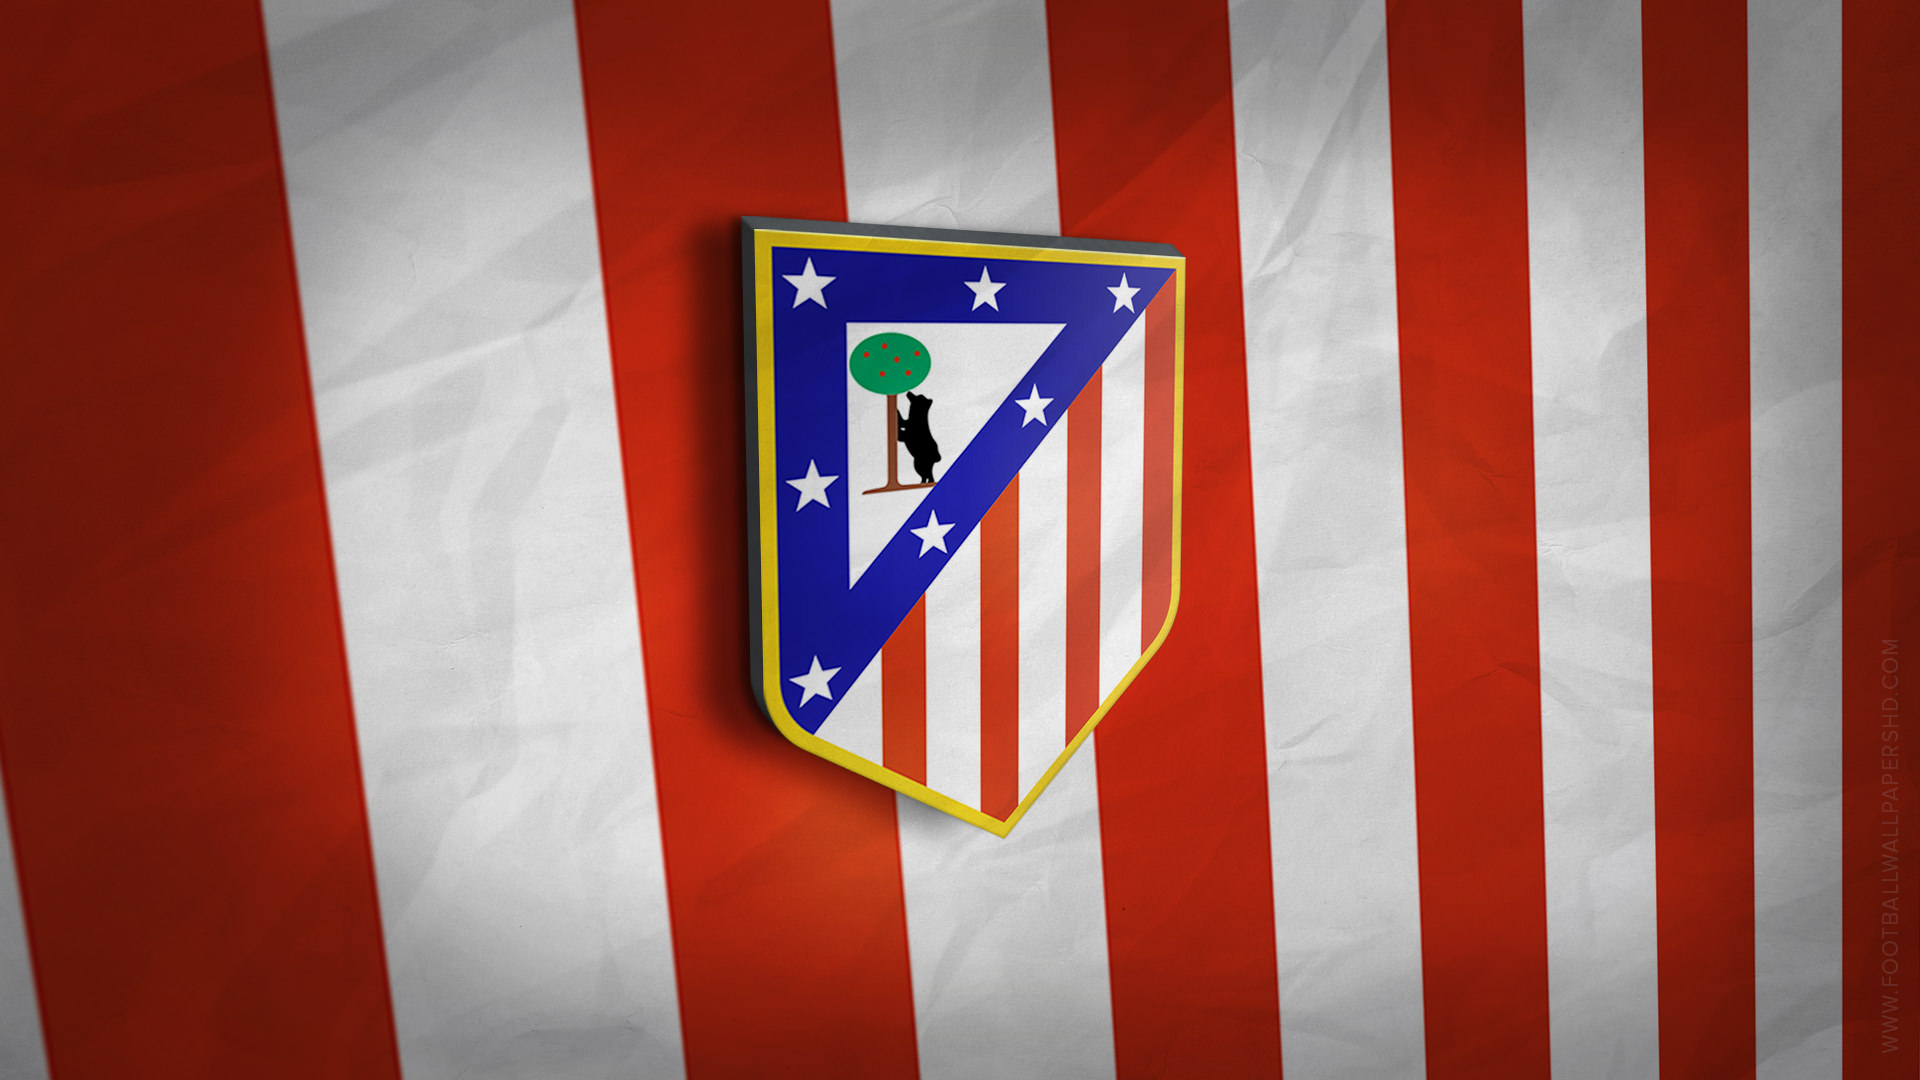 Hq 3d Wallpapers Free Download Hd Atletico Madrid Logo Wallpaper Pixelstalk Net